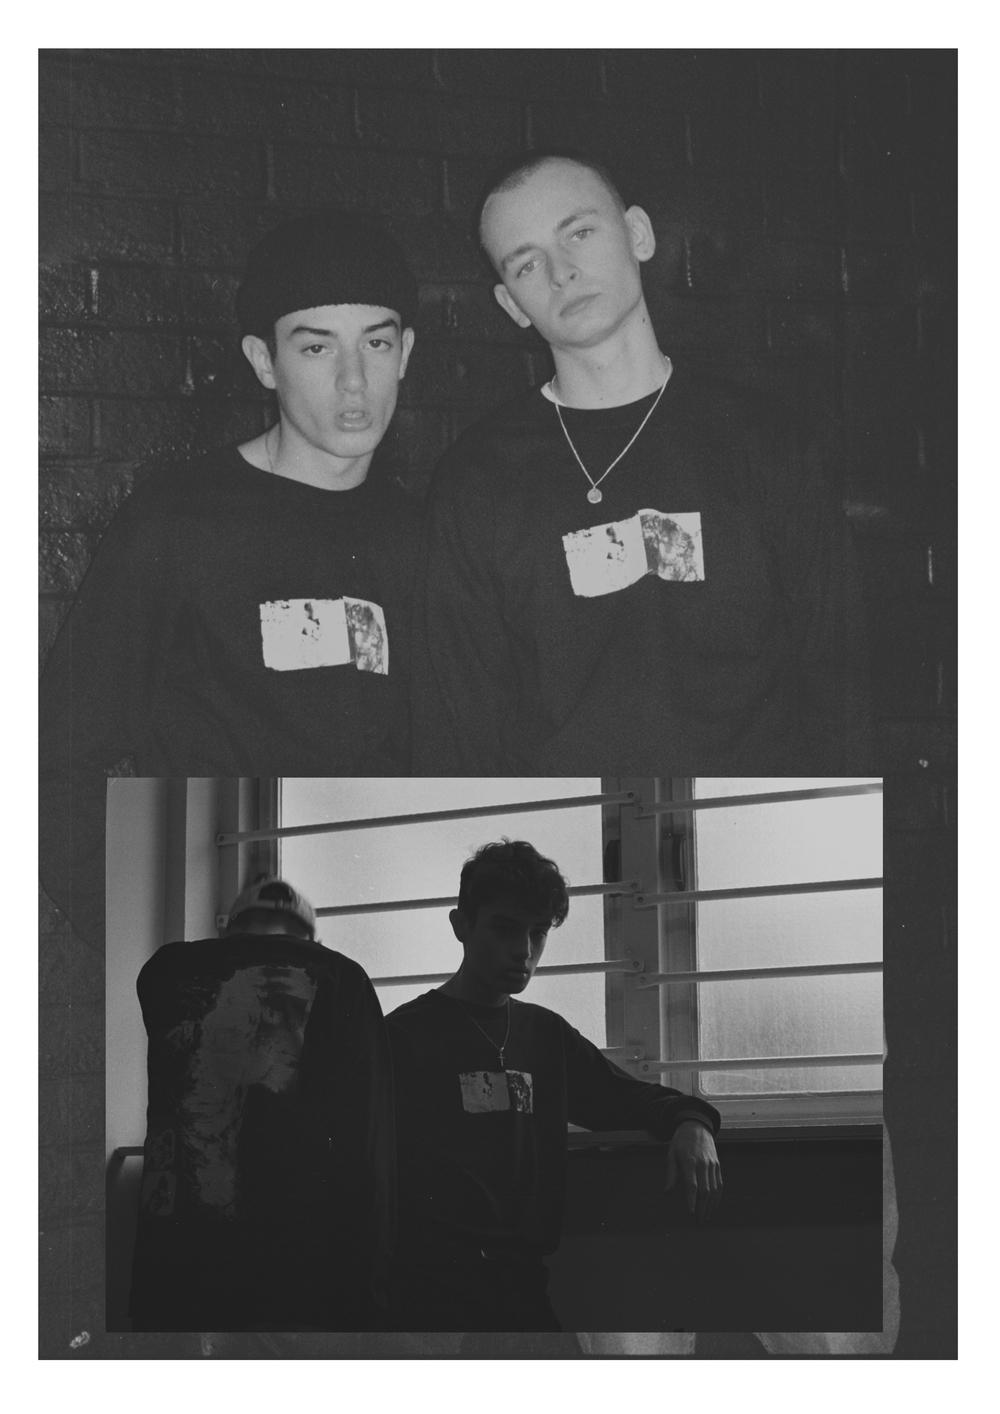 Models Jay Izzard (@jayizzard) and Ibrahim McGinty (@ibrahim_mcginty)